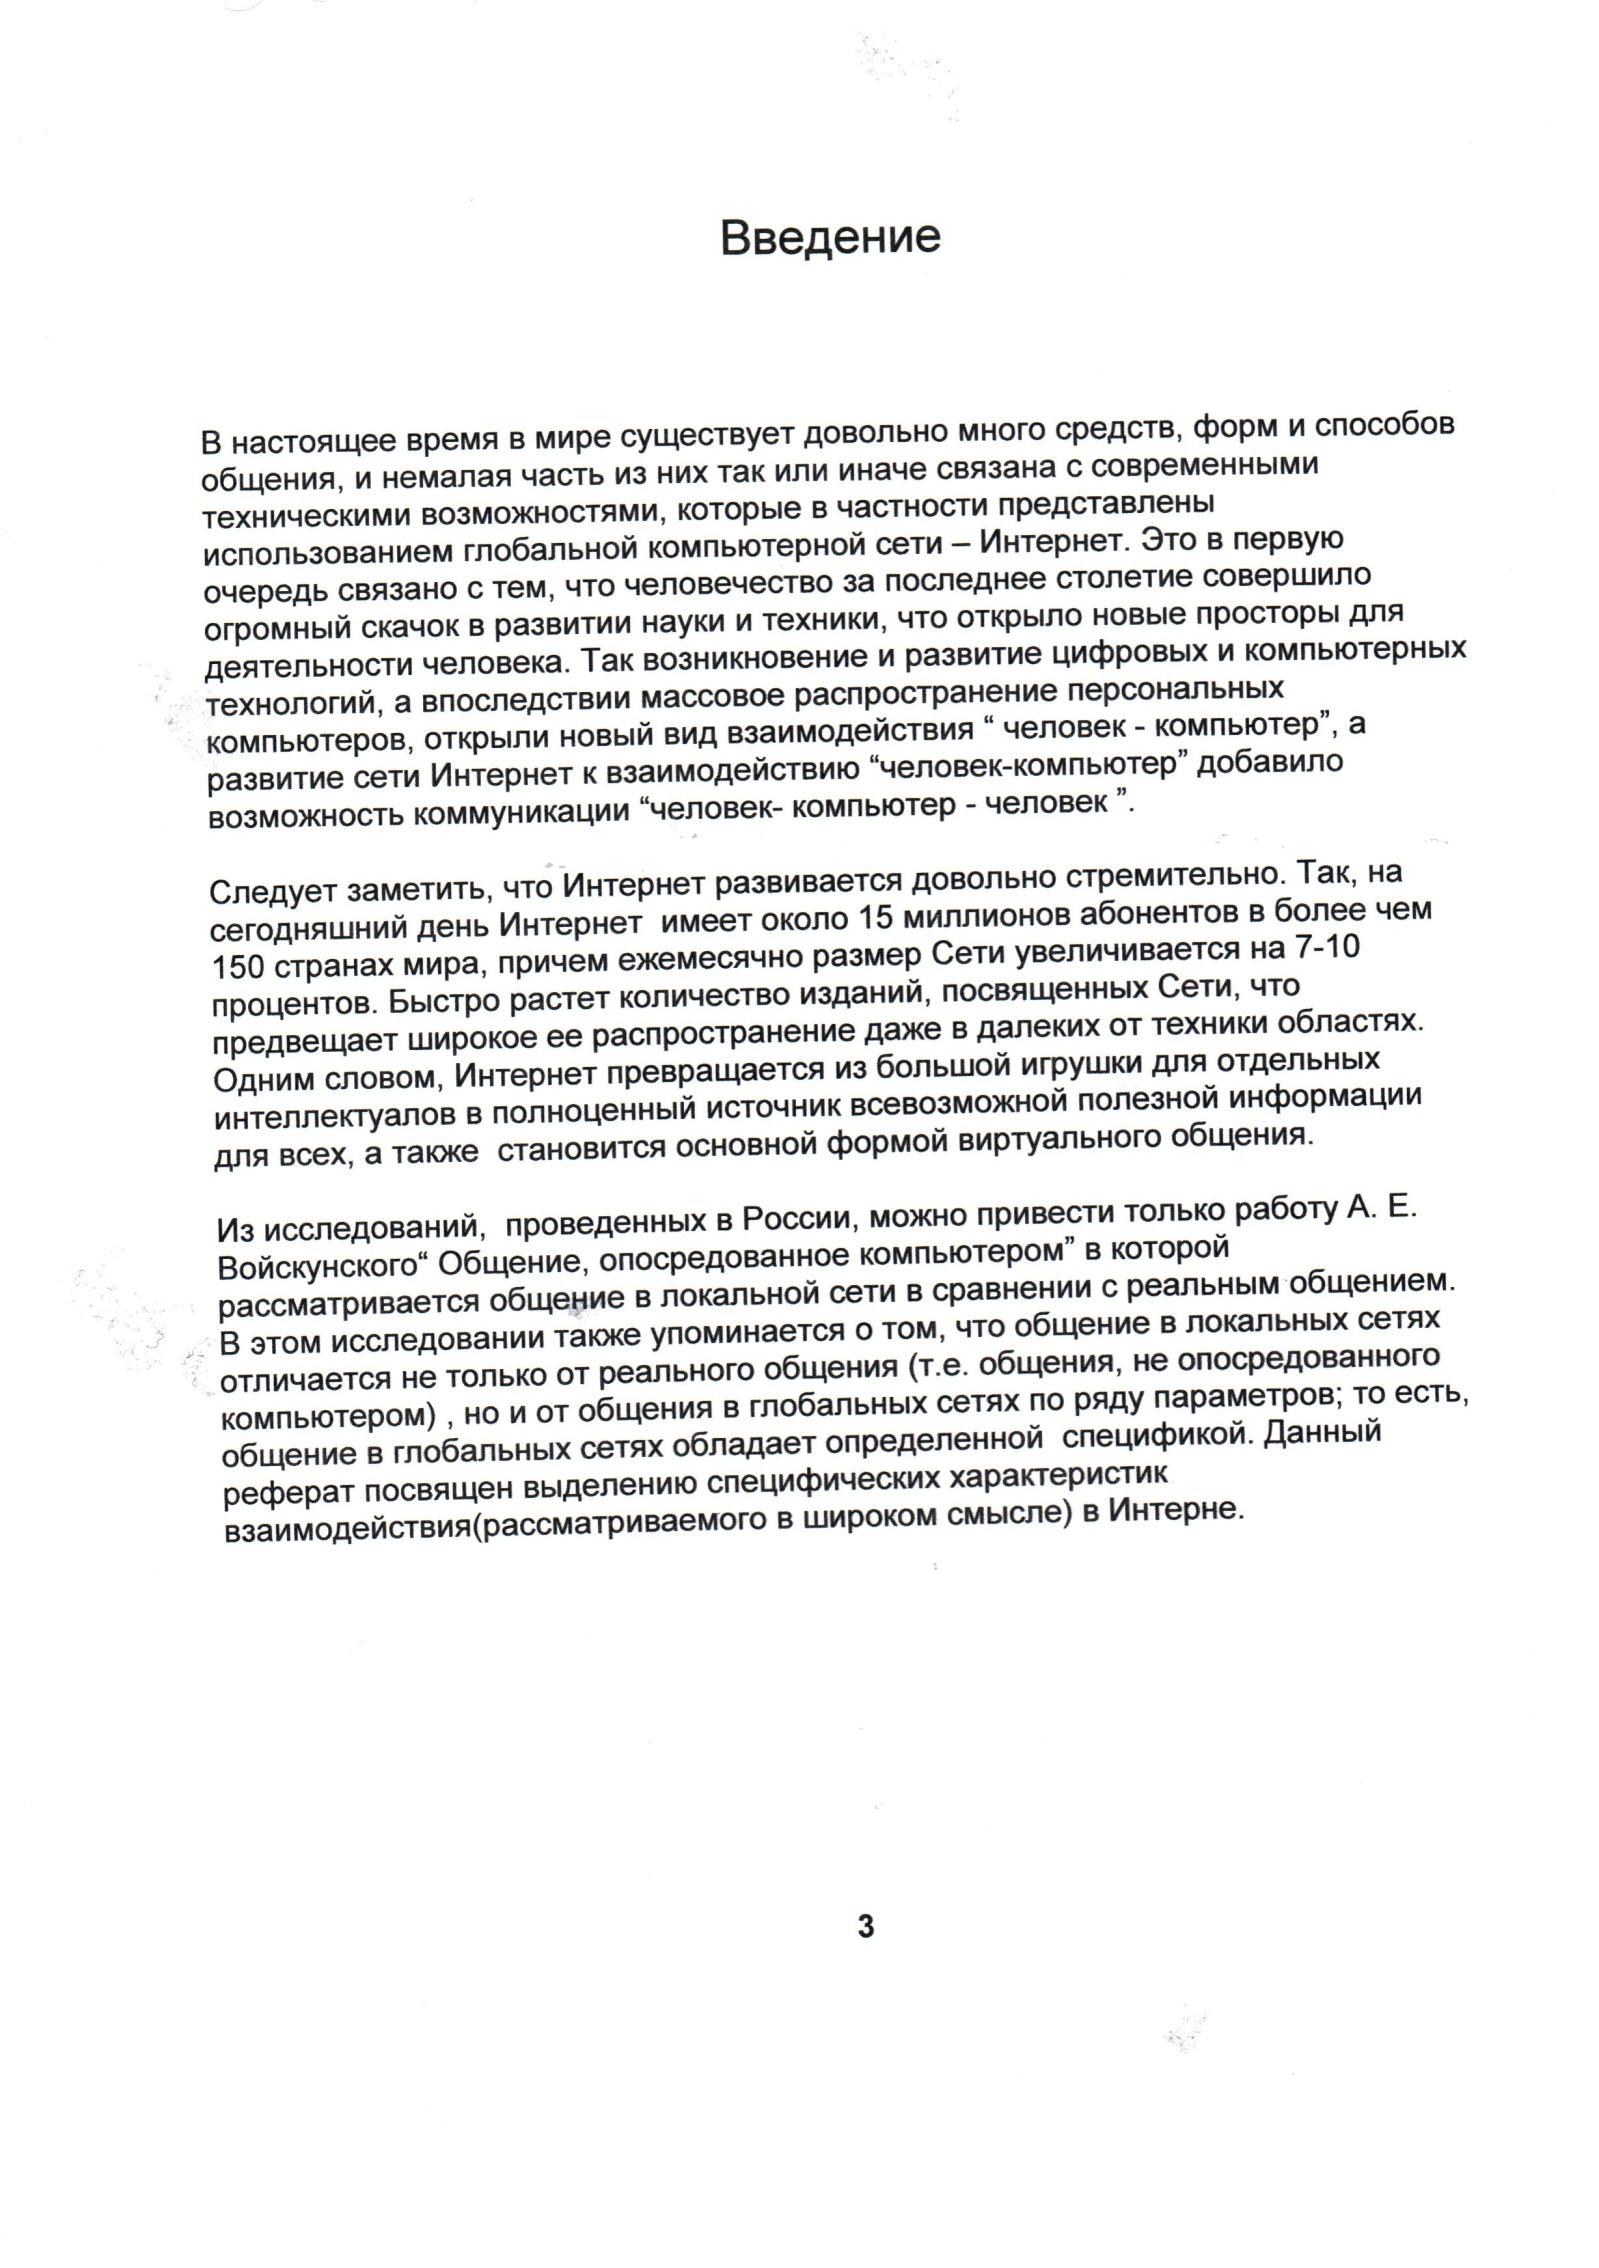 C:\Users\Ирина\Documents\Panasonic\MFS\Scan\20160225_103716.jpg